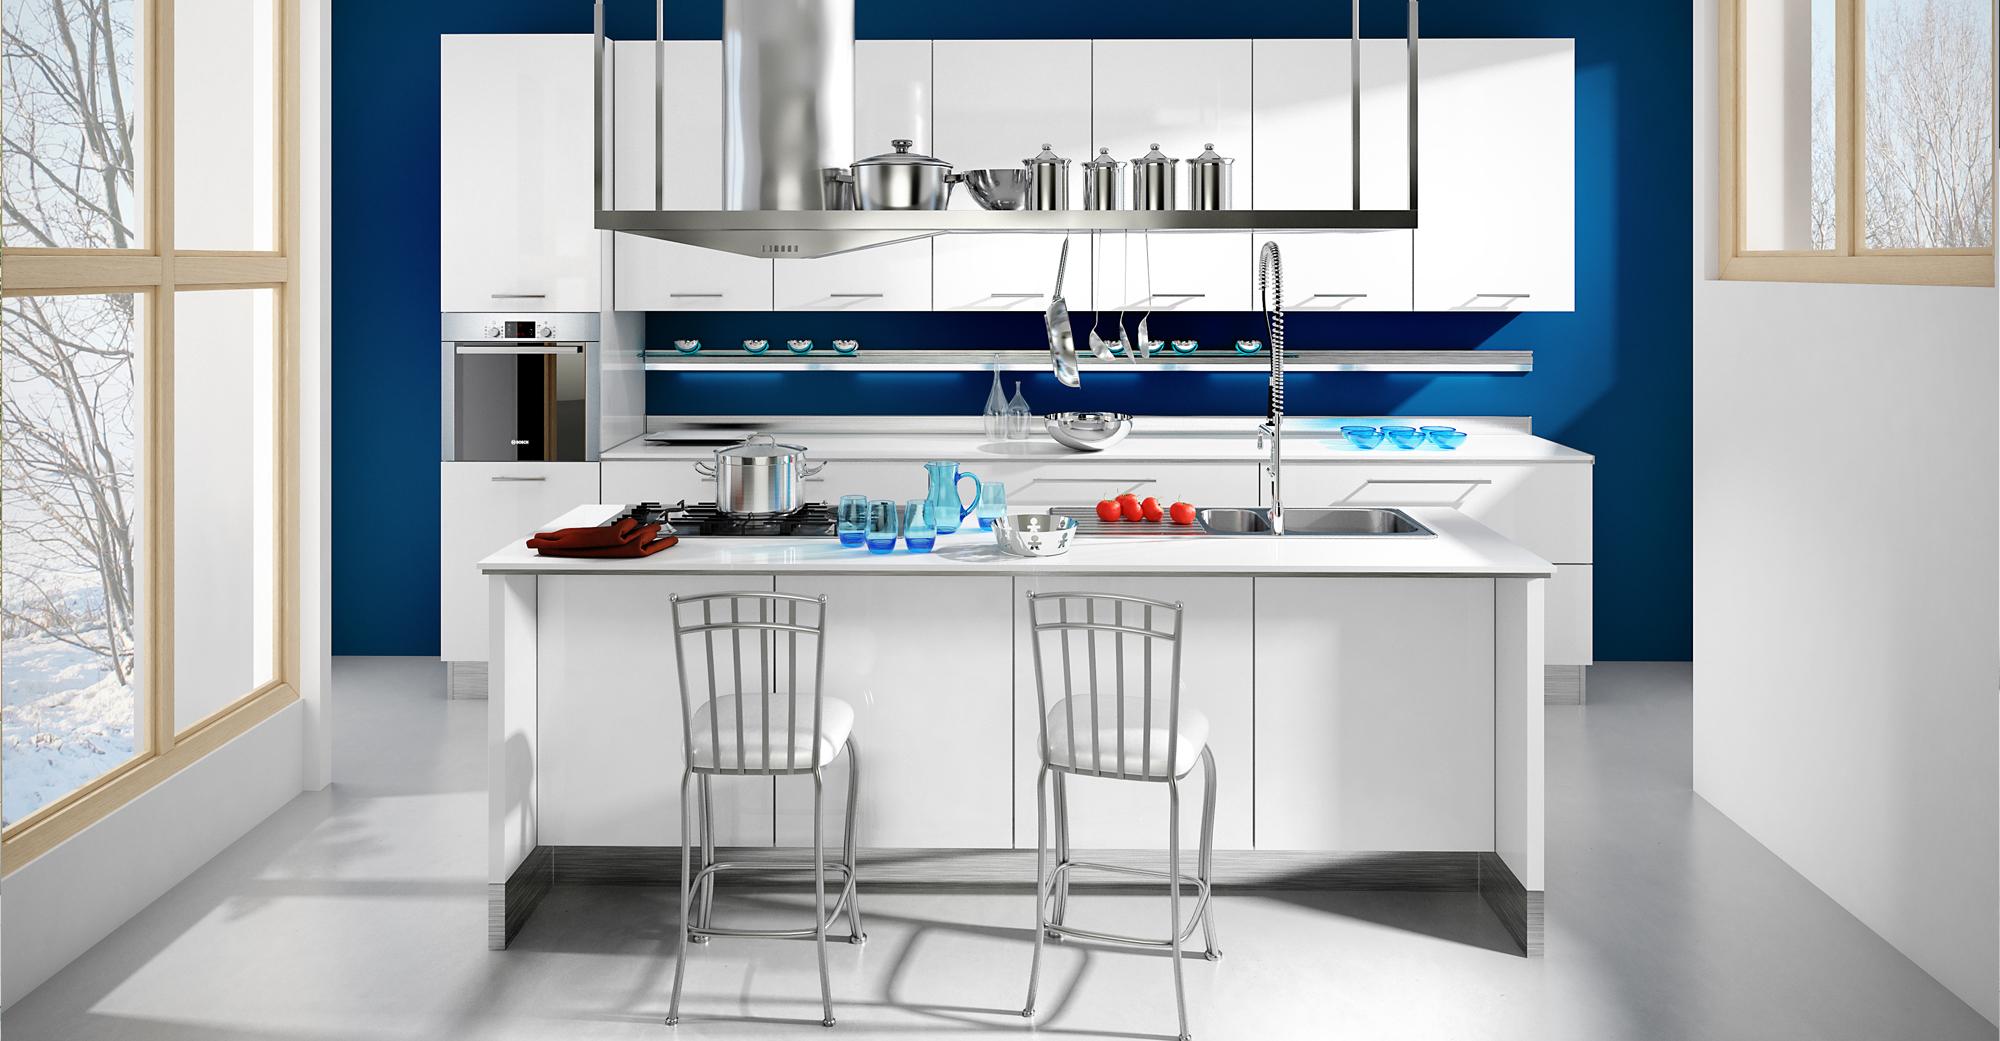 World Kitchens & Granite Inc 1558 Palm Beach Lakes Blvd, West Palm ...